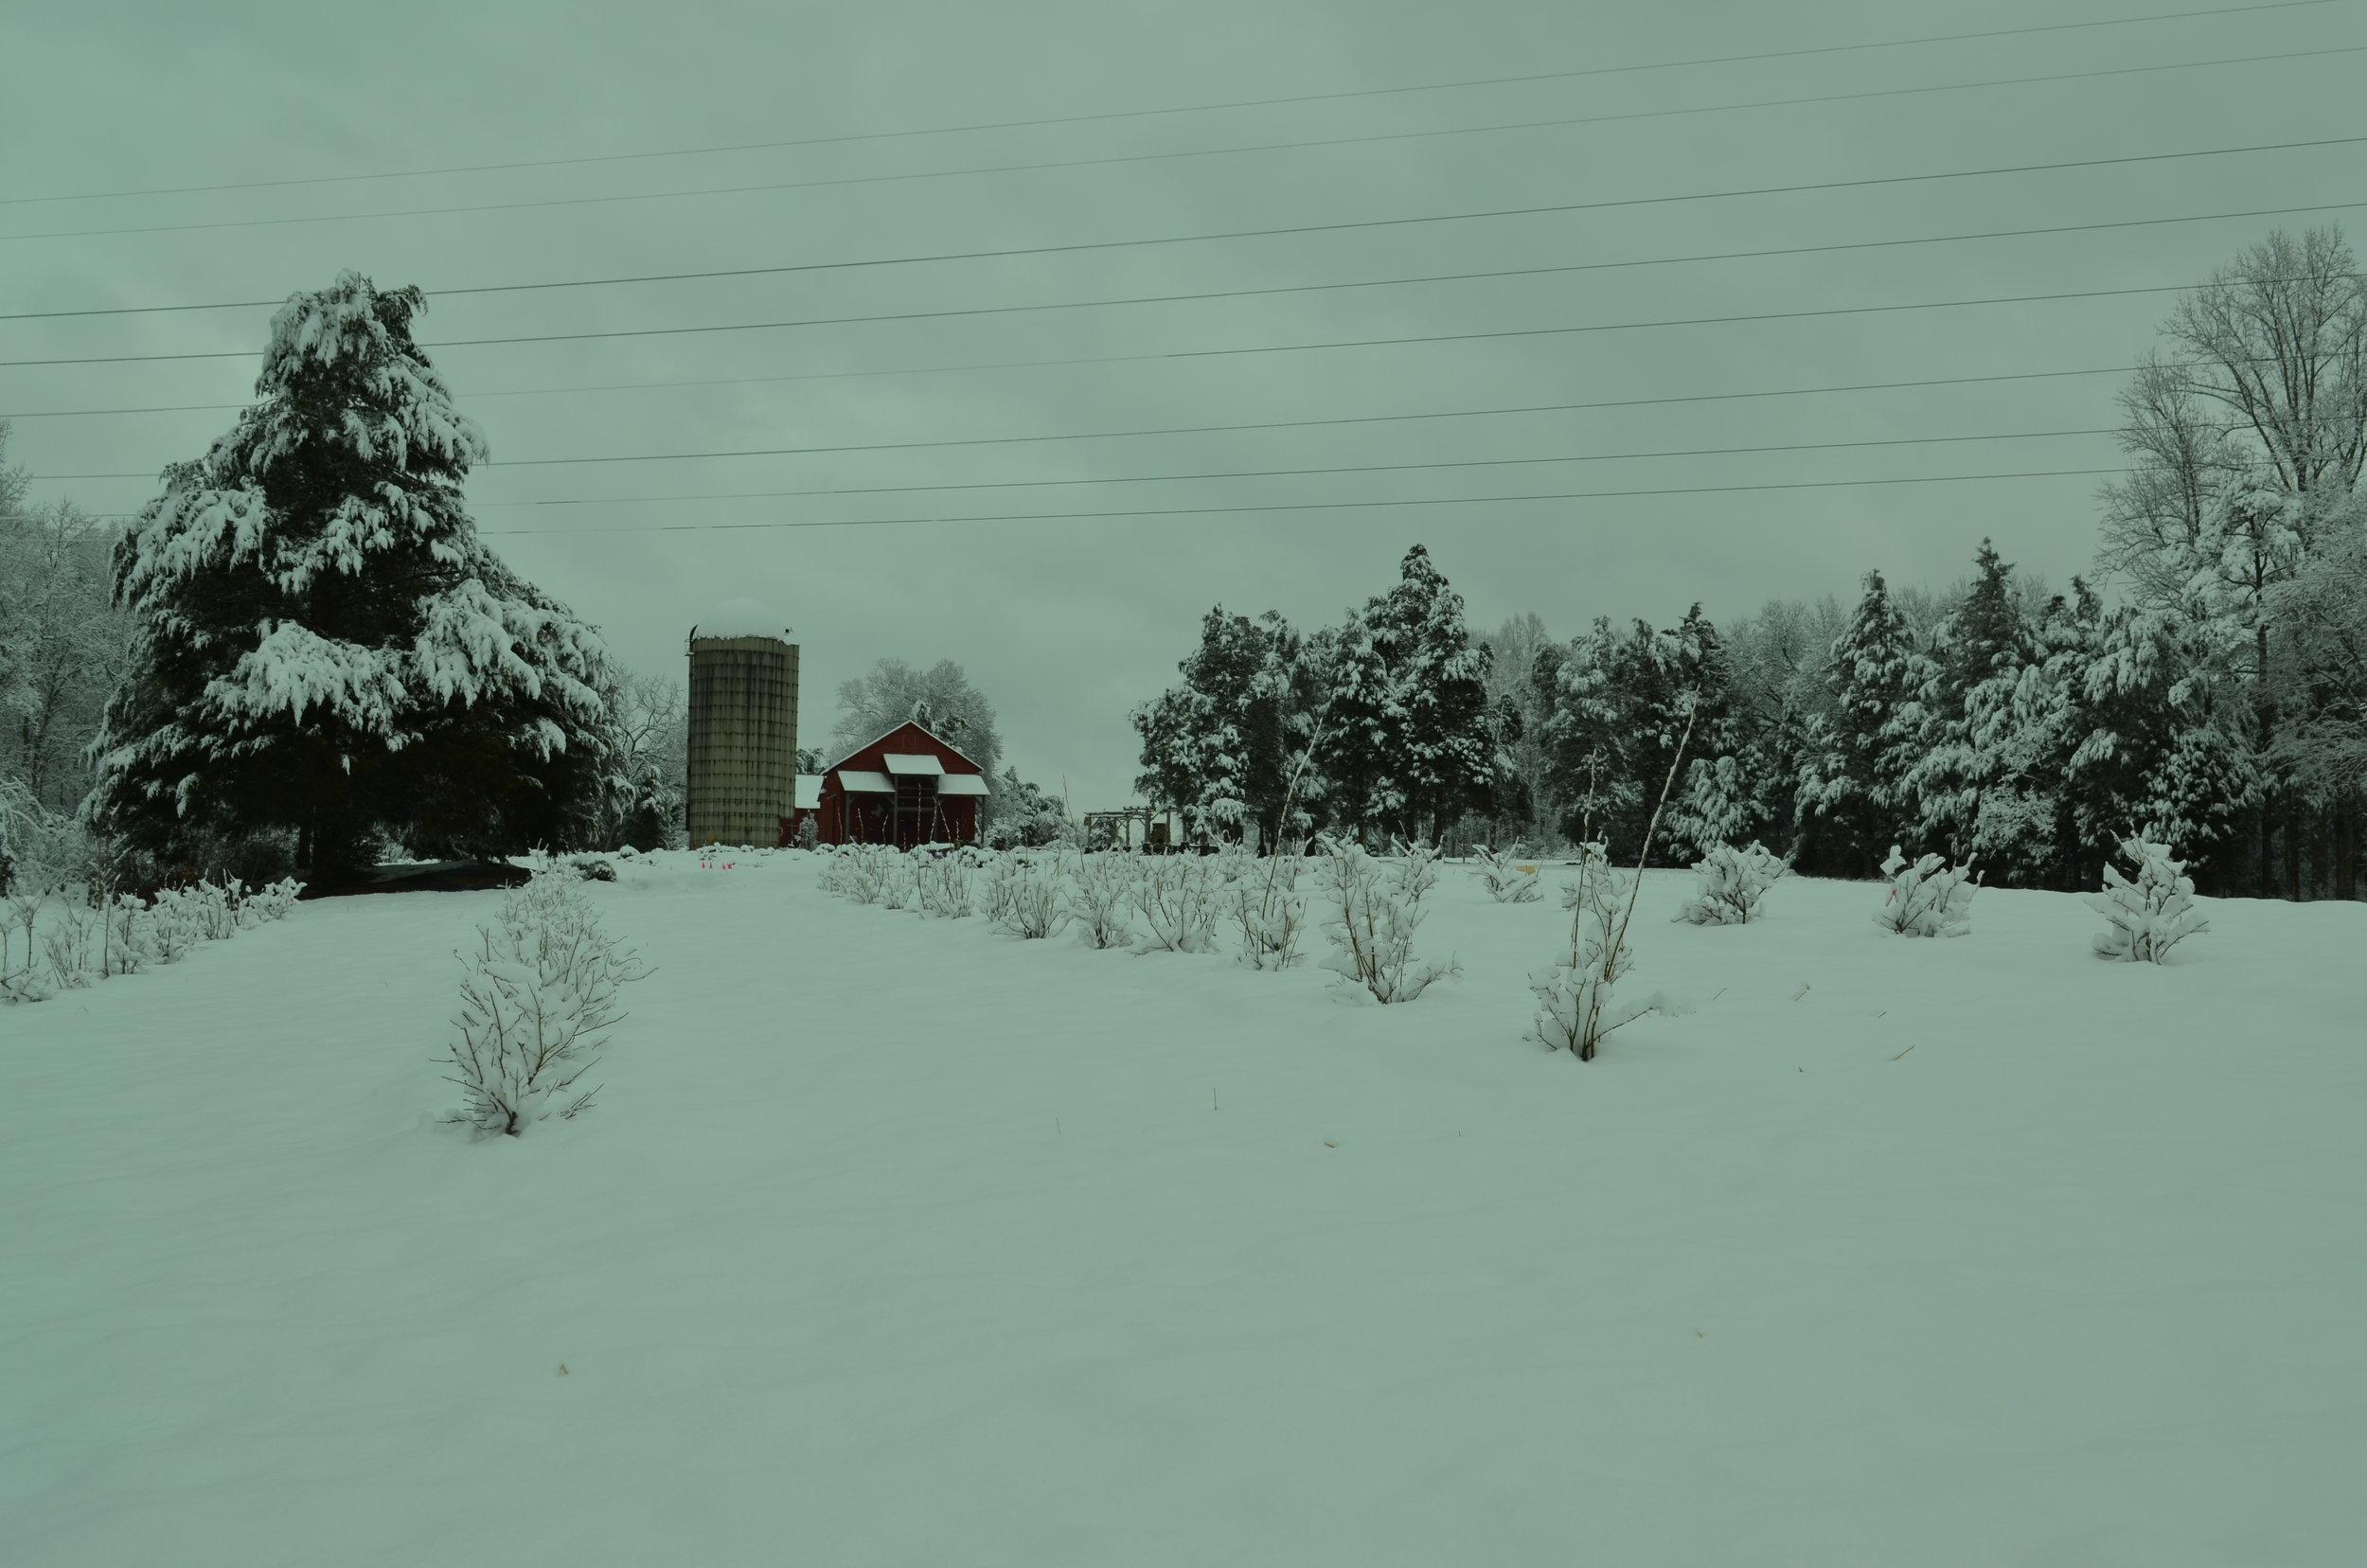 Snow day at Hauser Creek Farm